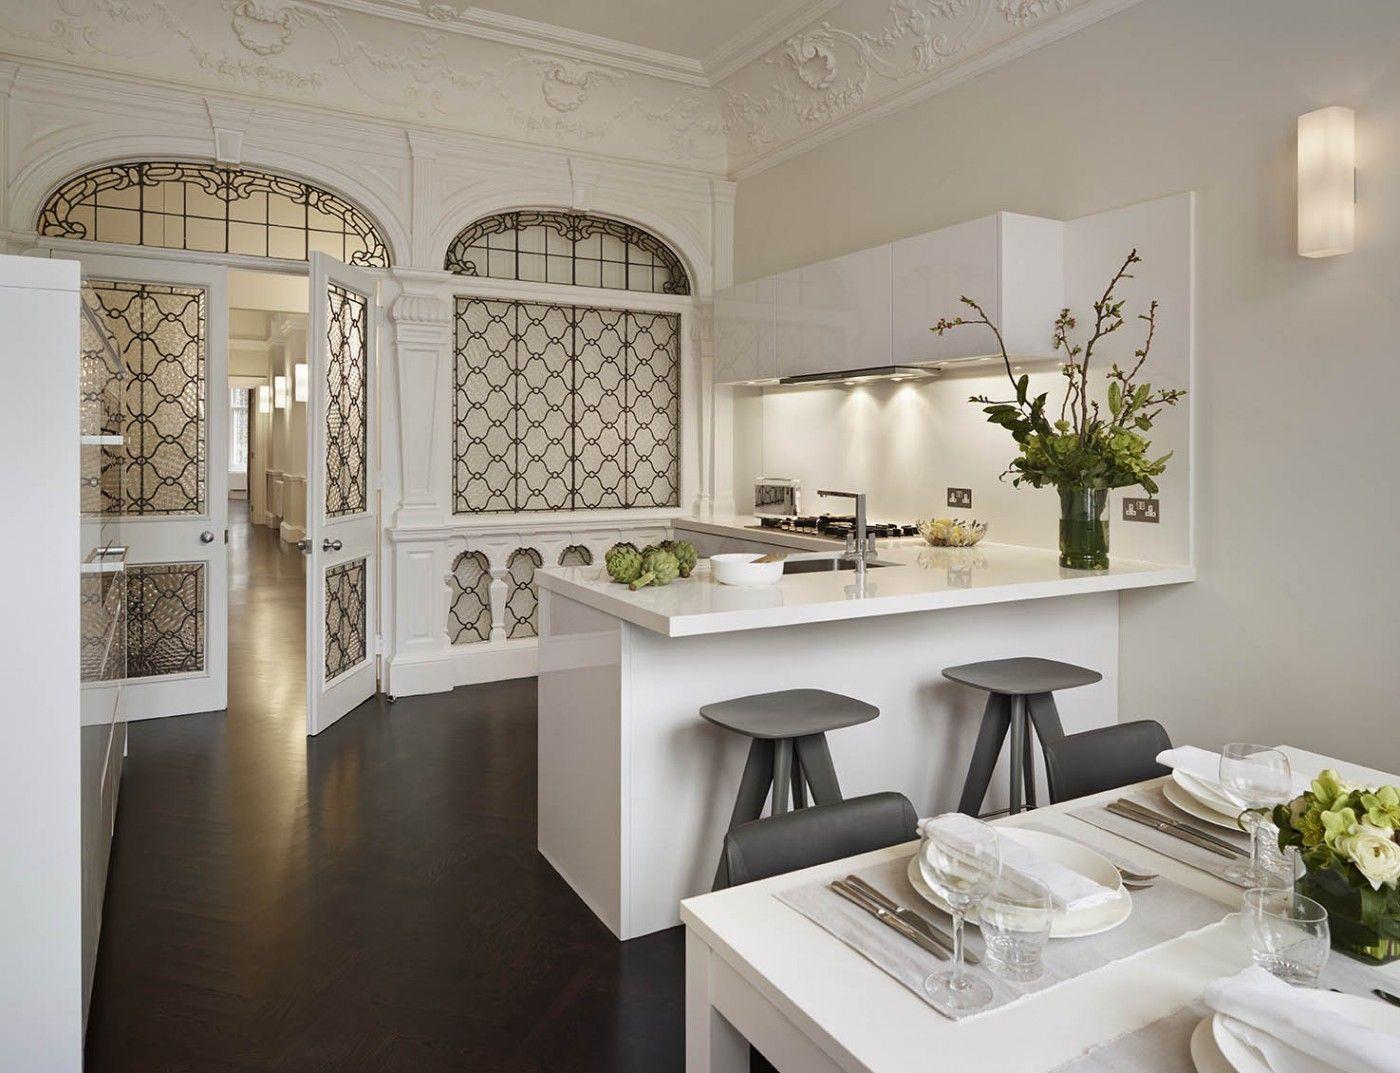 Modern White Kitchen In Knightsbridge, London. Elan Kitchens 55 New Kingu0027s  Road, London, SW6 4SE. Www.elankitchens.co.uk